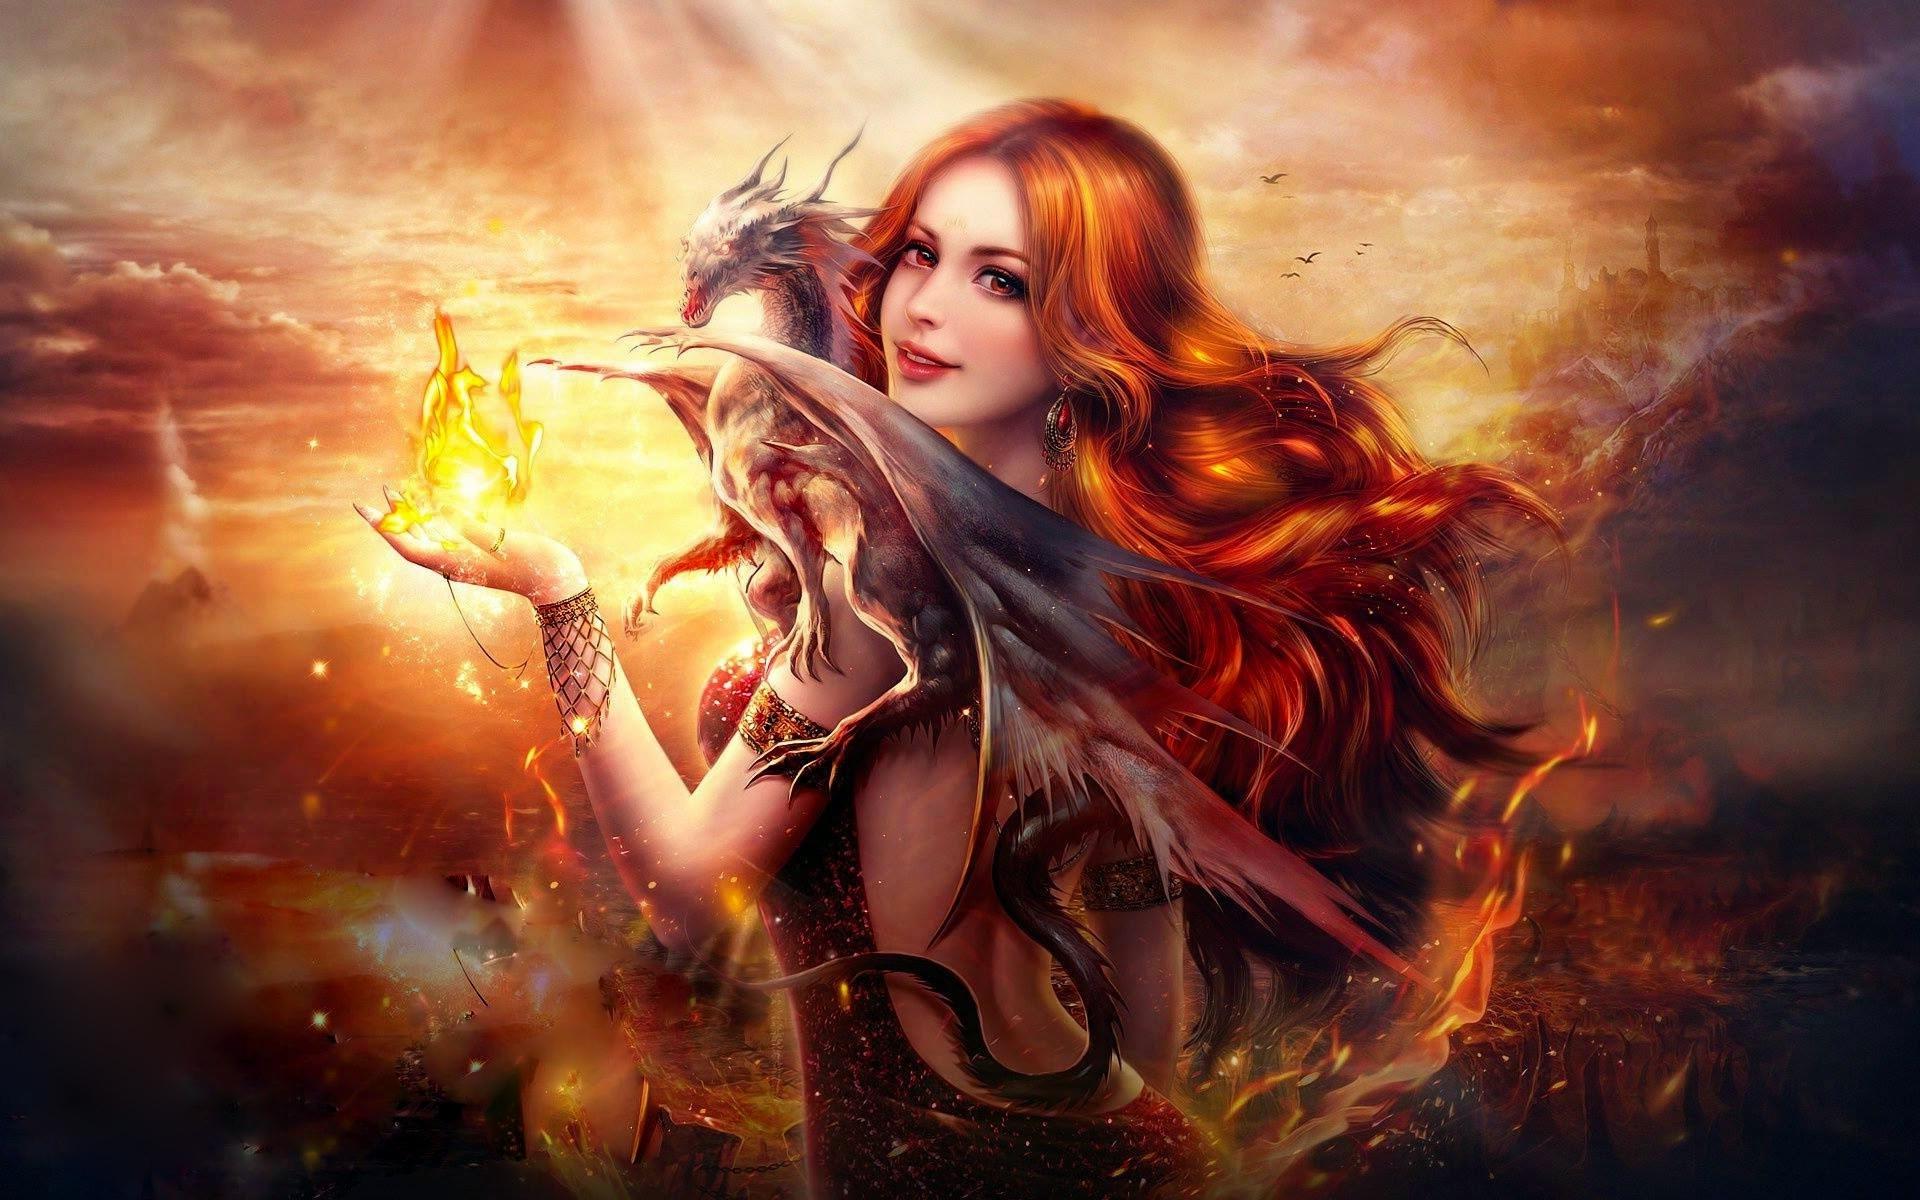 1366x768 fantasy girl dragon fire 1366x768 resolution hd 4k